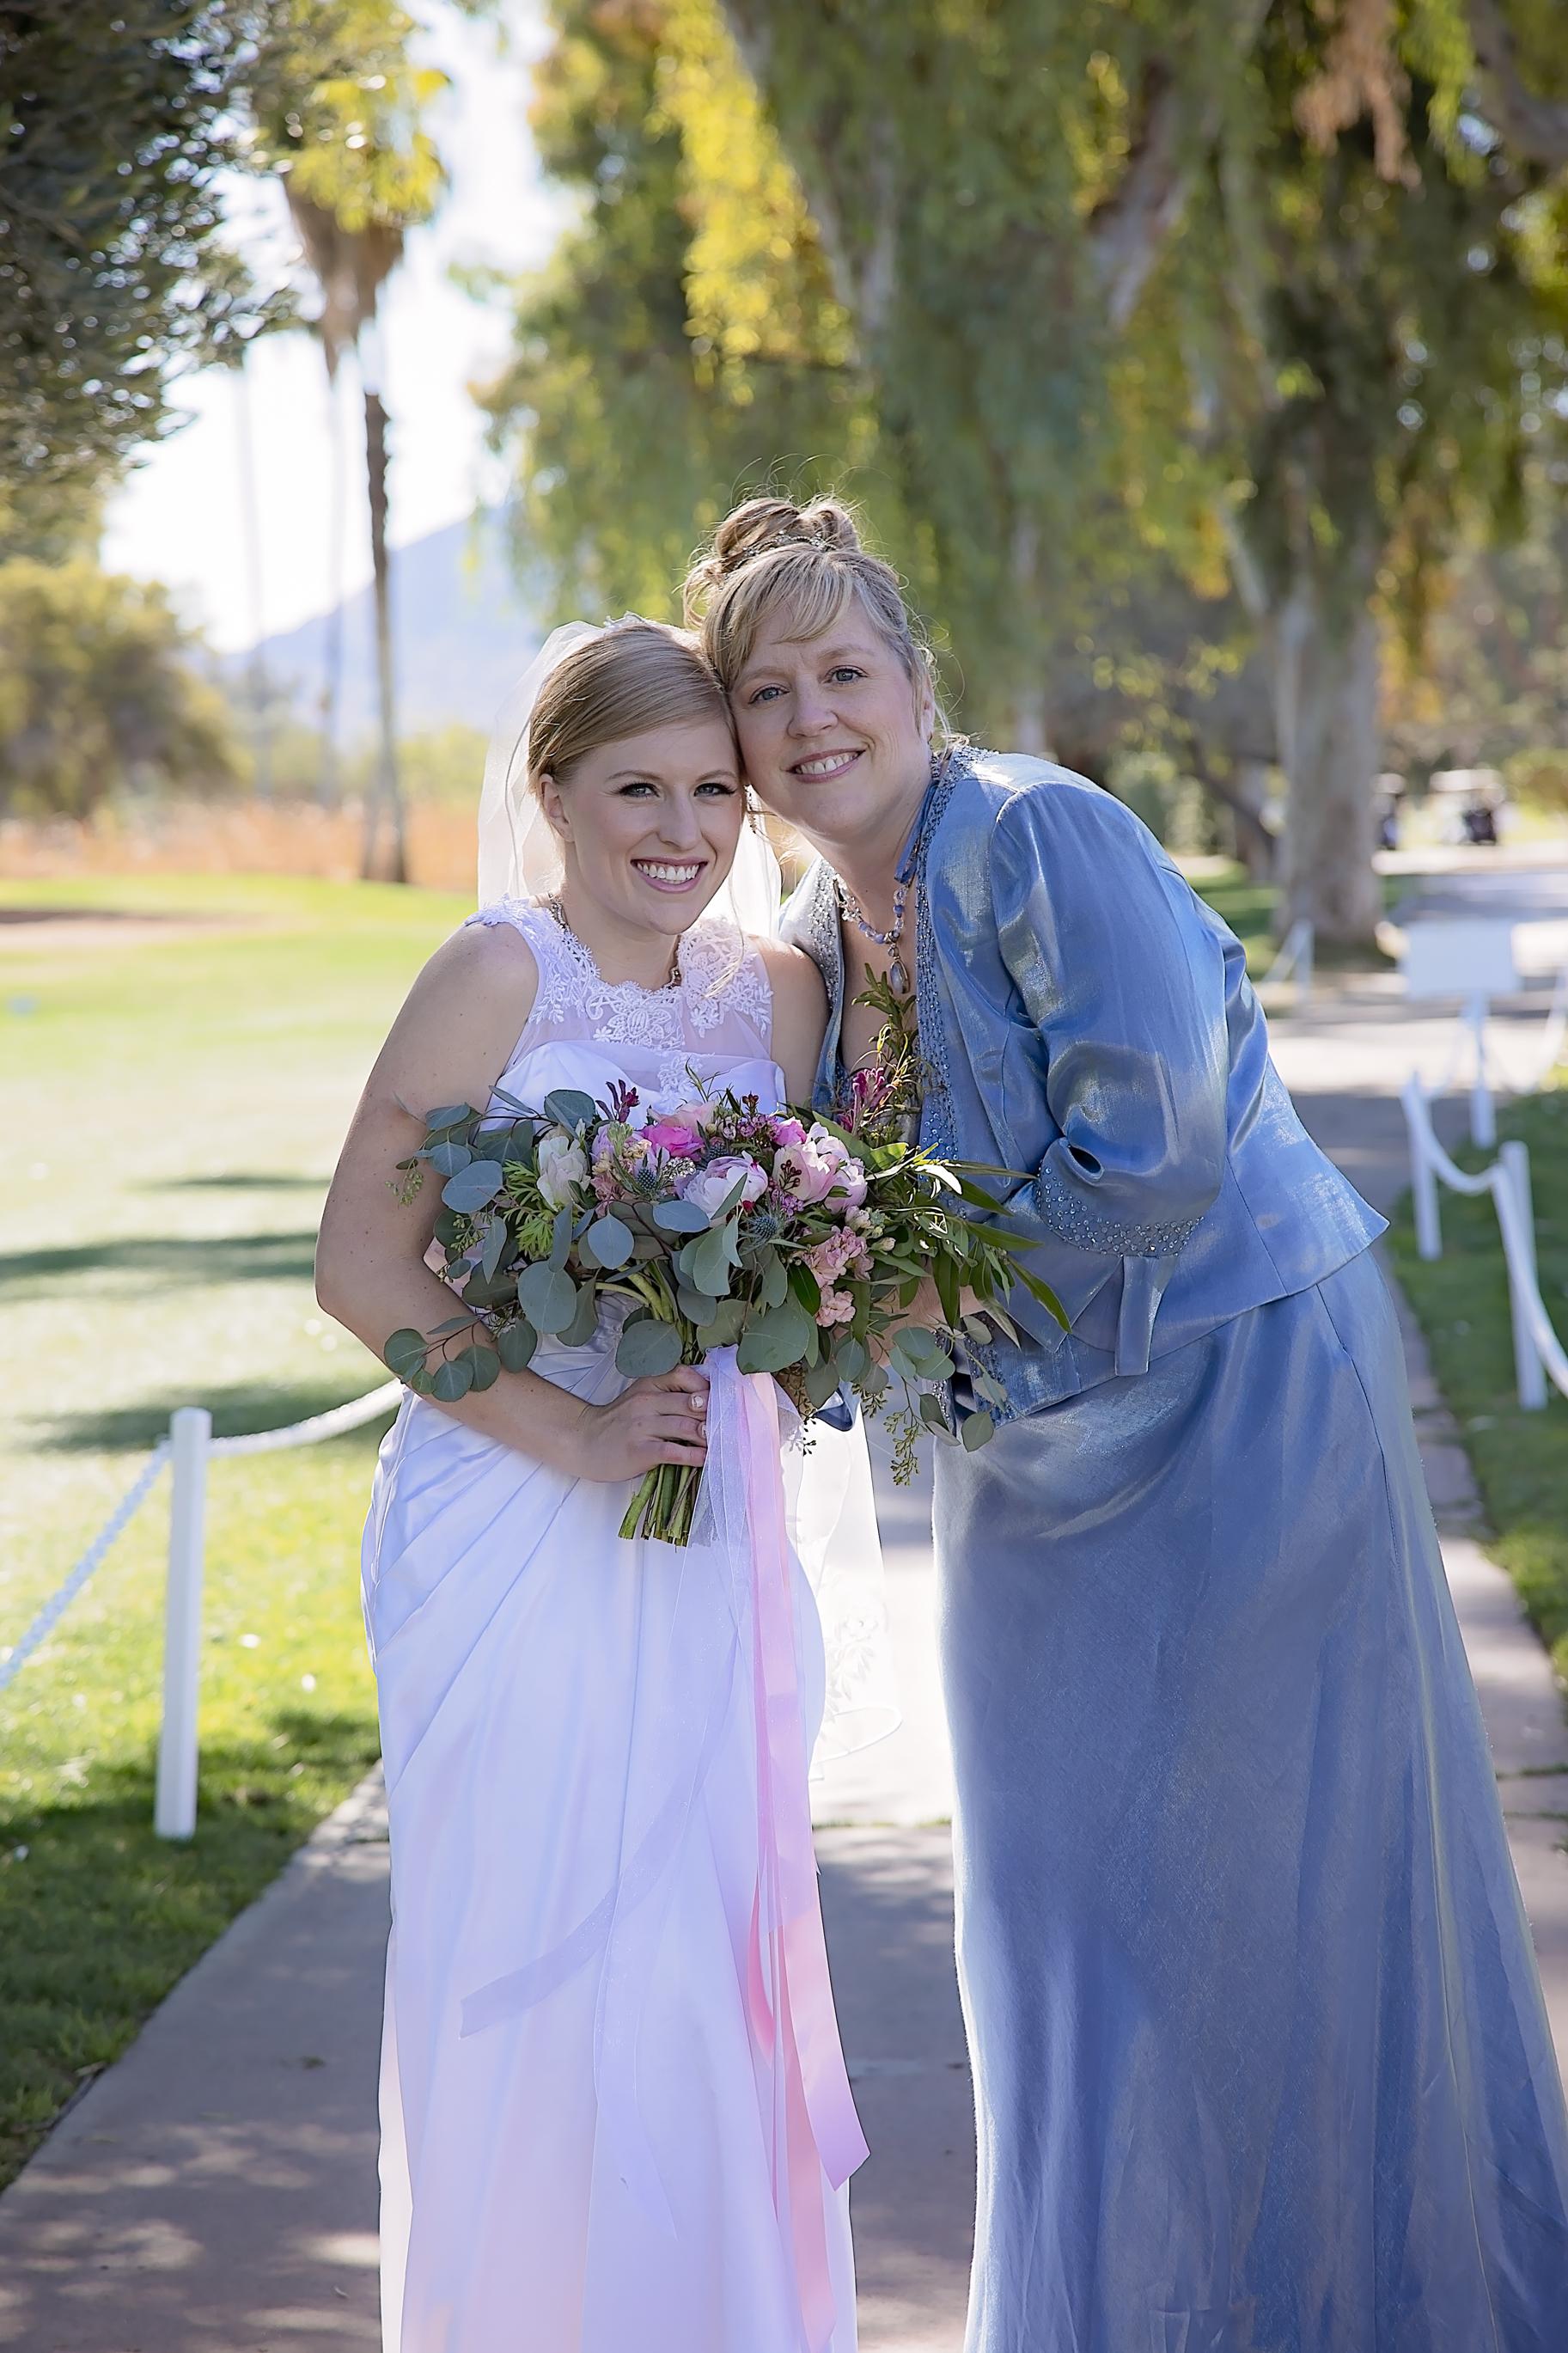 Enchanted Wedding Tours - Tea 1.30.16-38.jpg